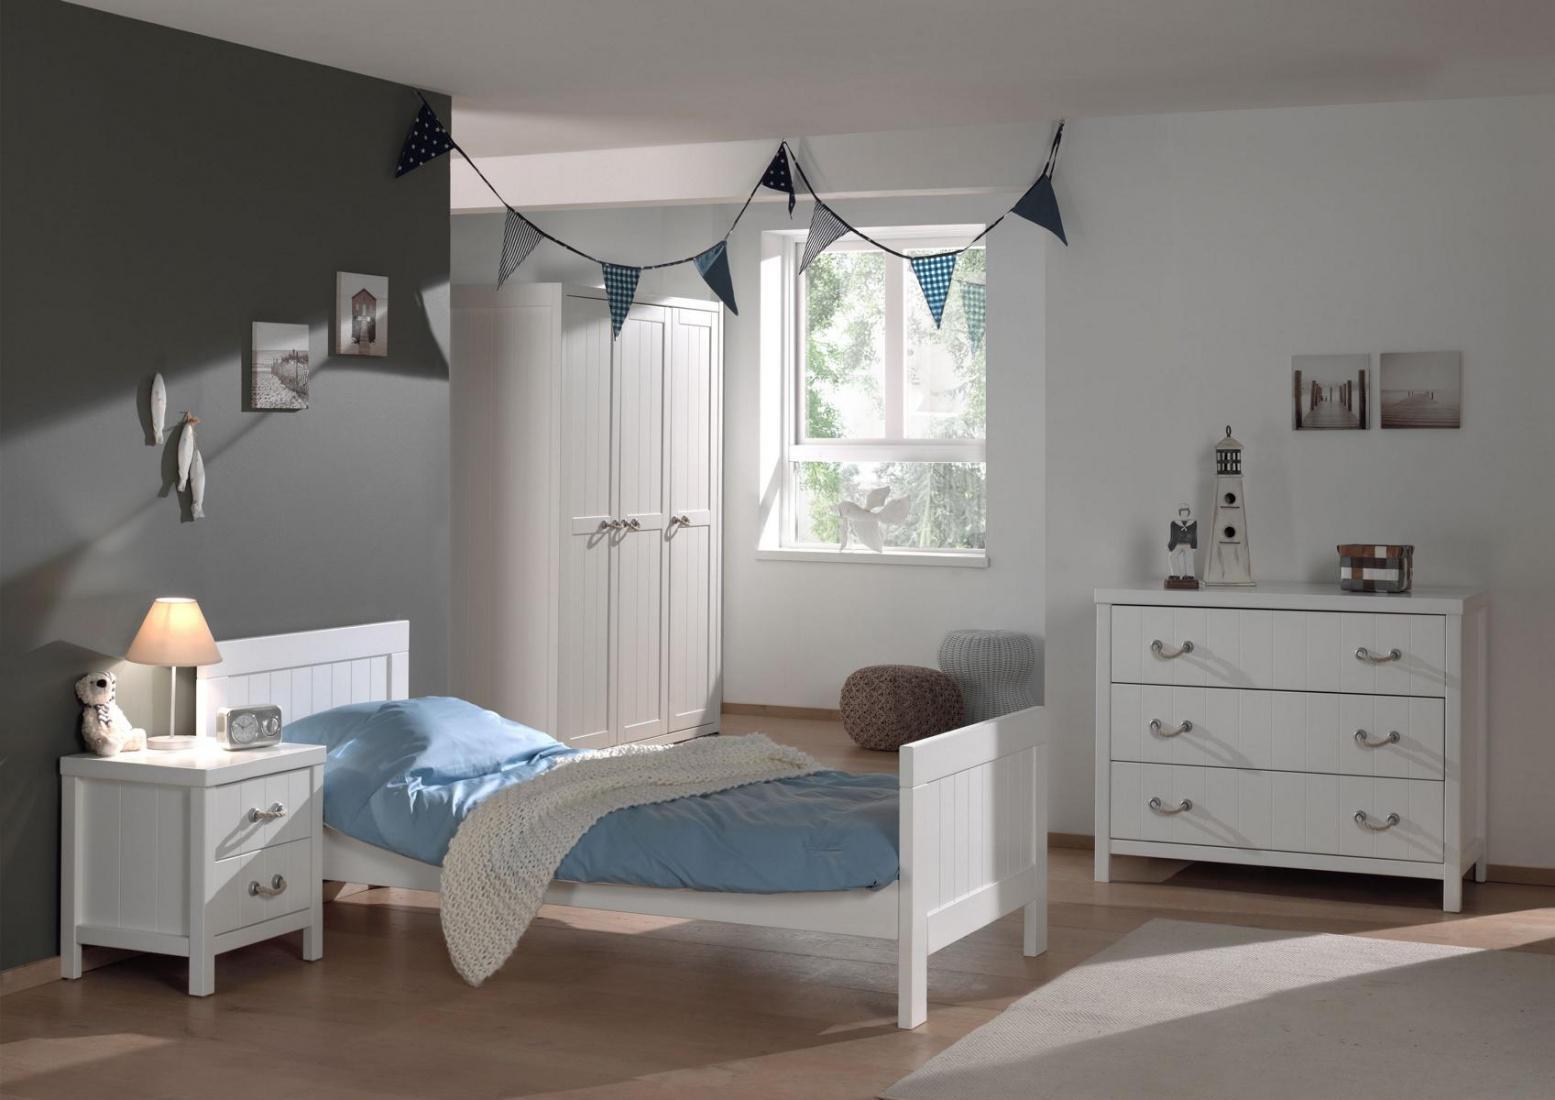 jugendzimmer set iny 4 teilig in wei kaufen bei m bel lux. Black Bedroom Furniture Sets. Home Design Ideas